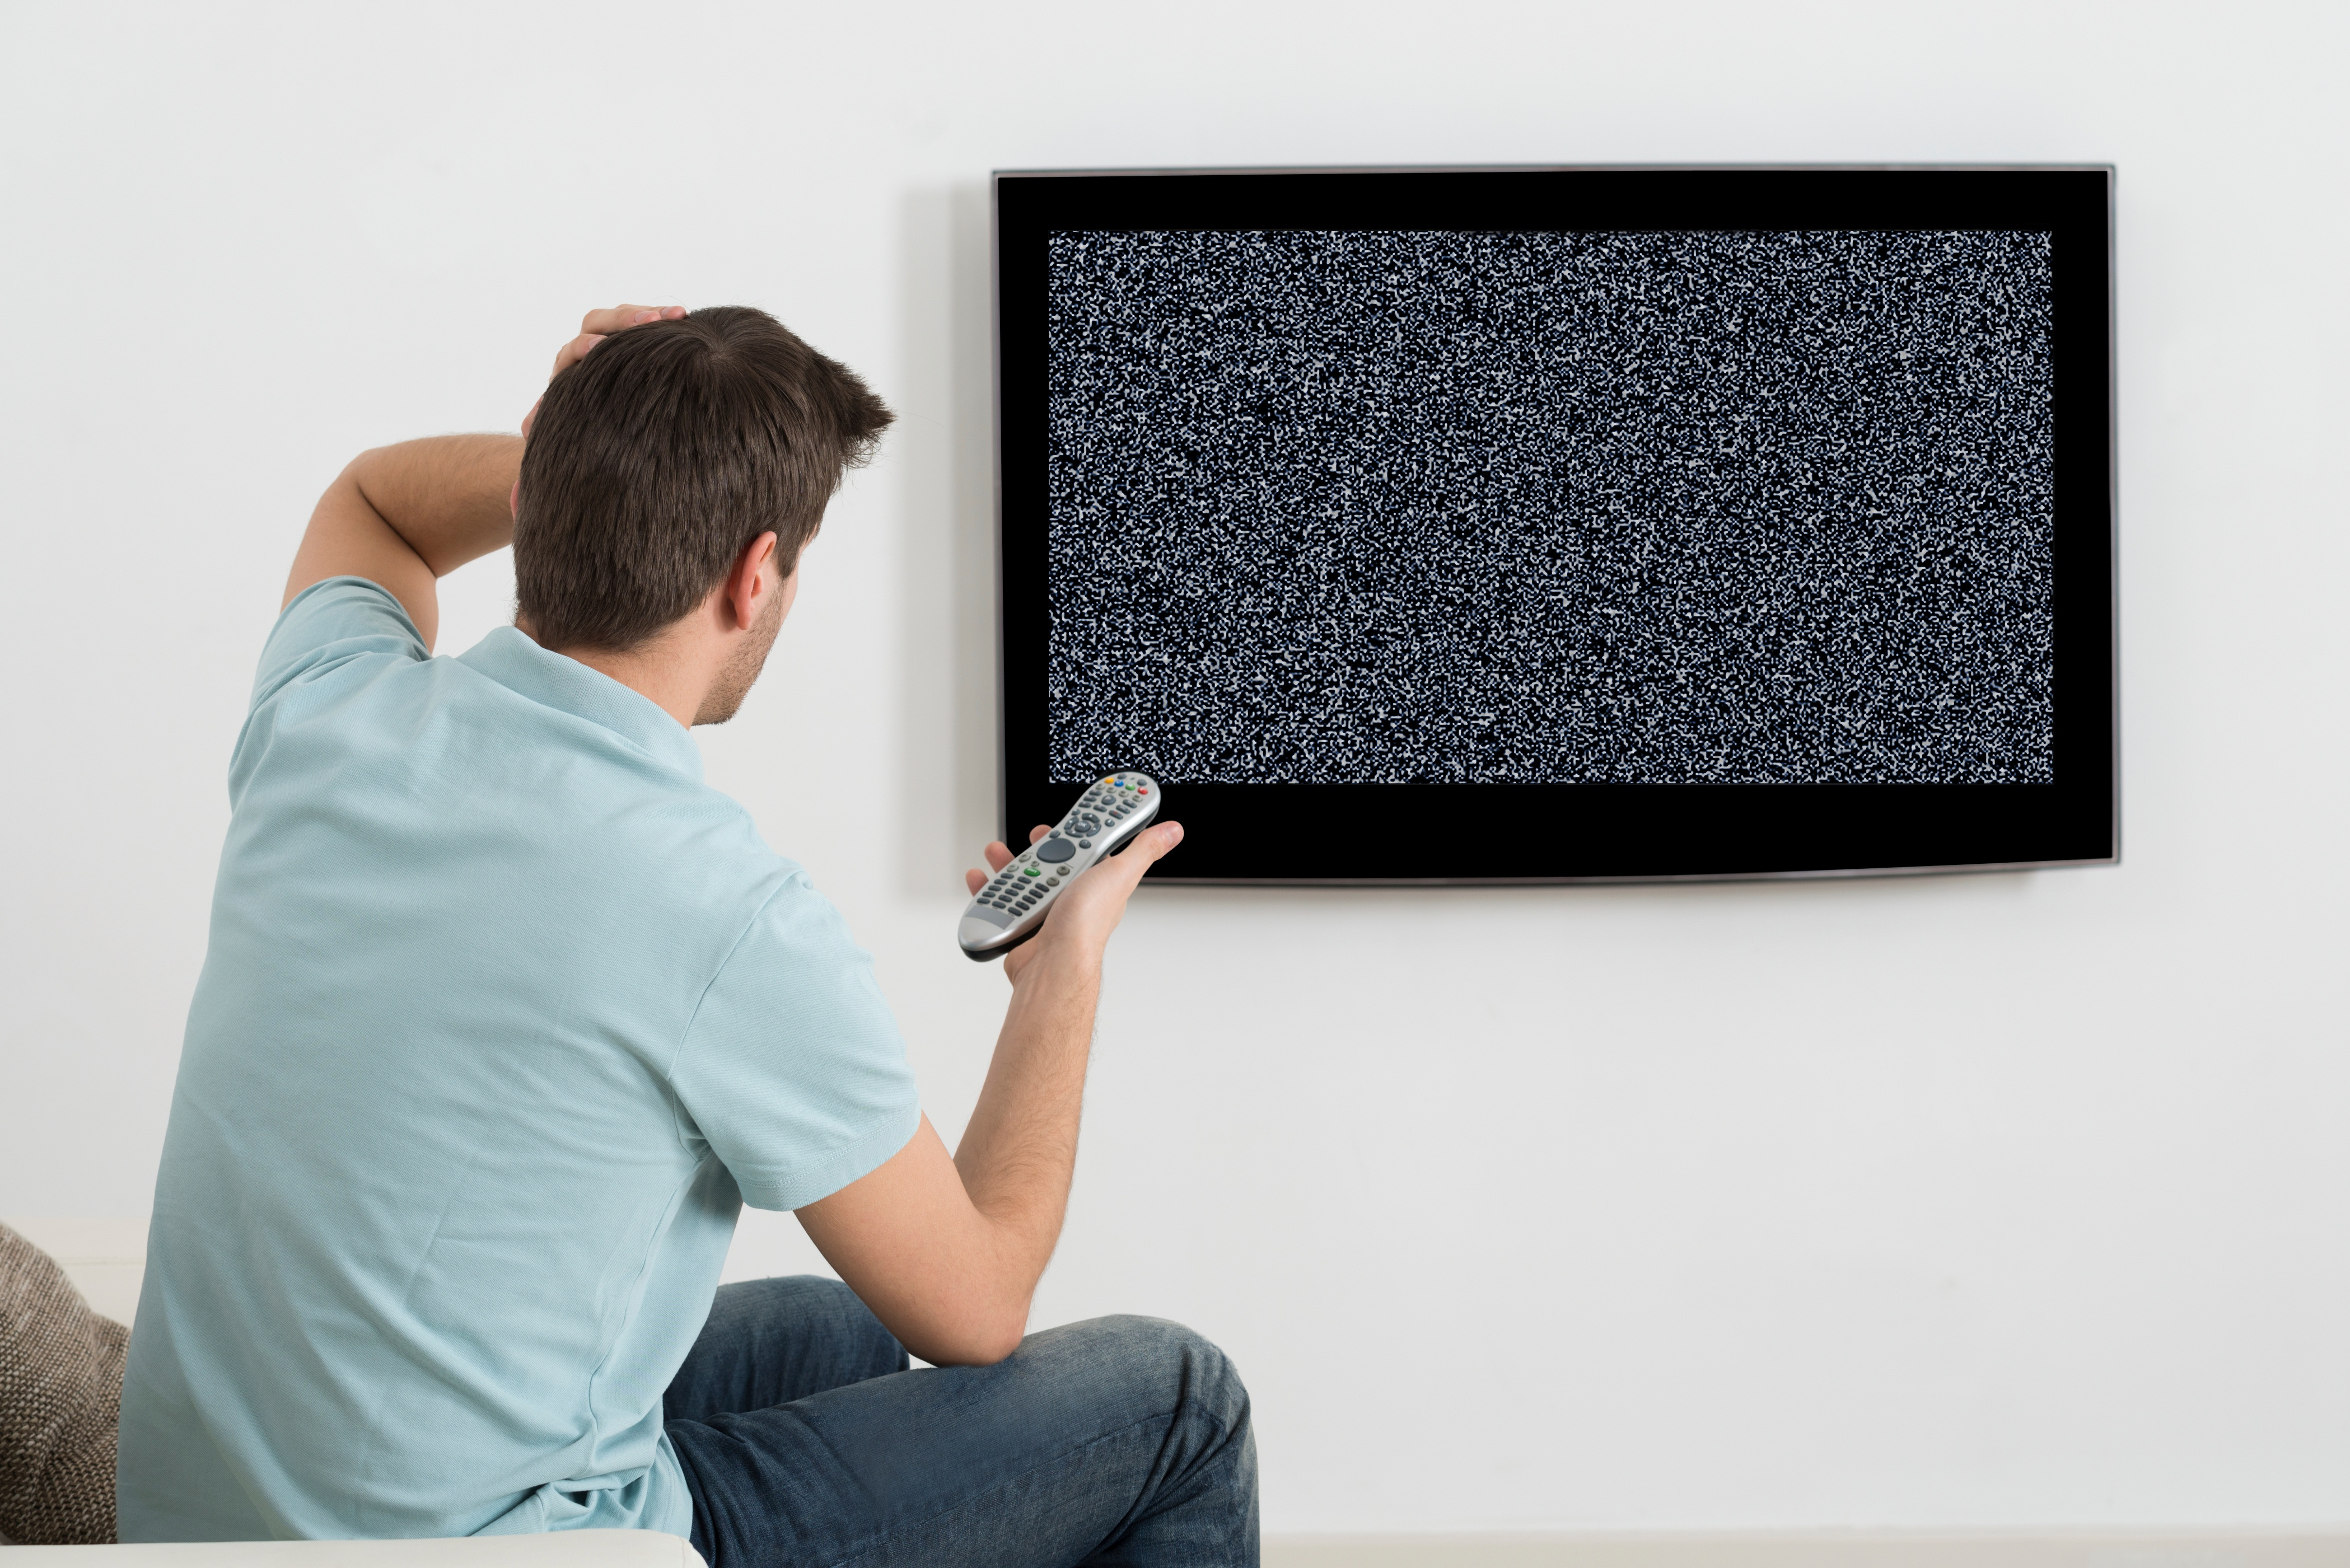 BroadcastiStock_105127895_XLARGE (00000002).jpg